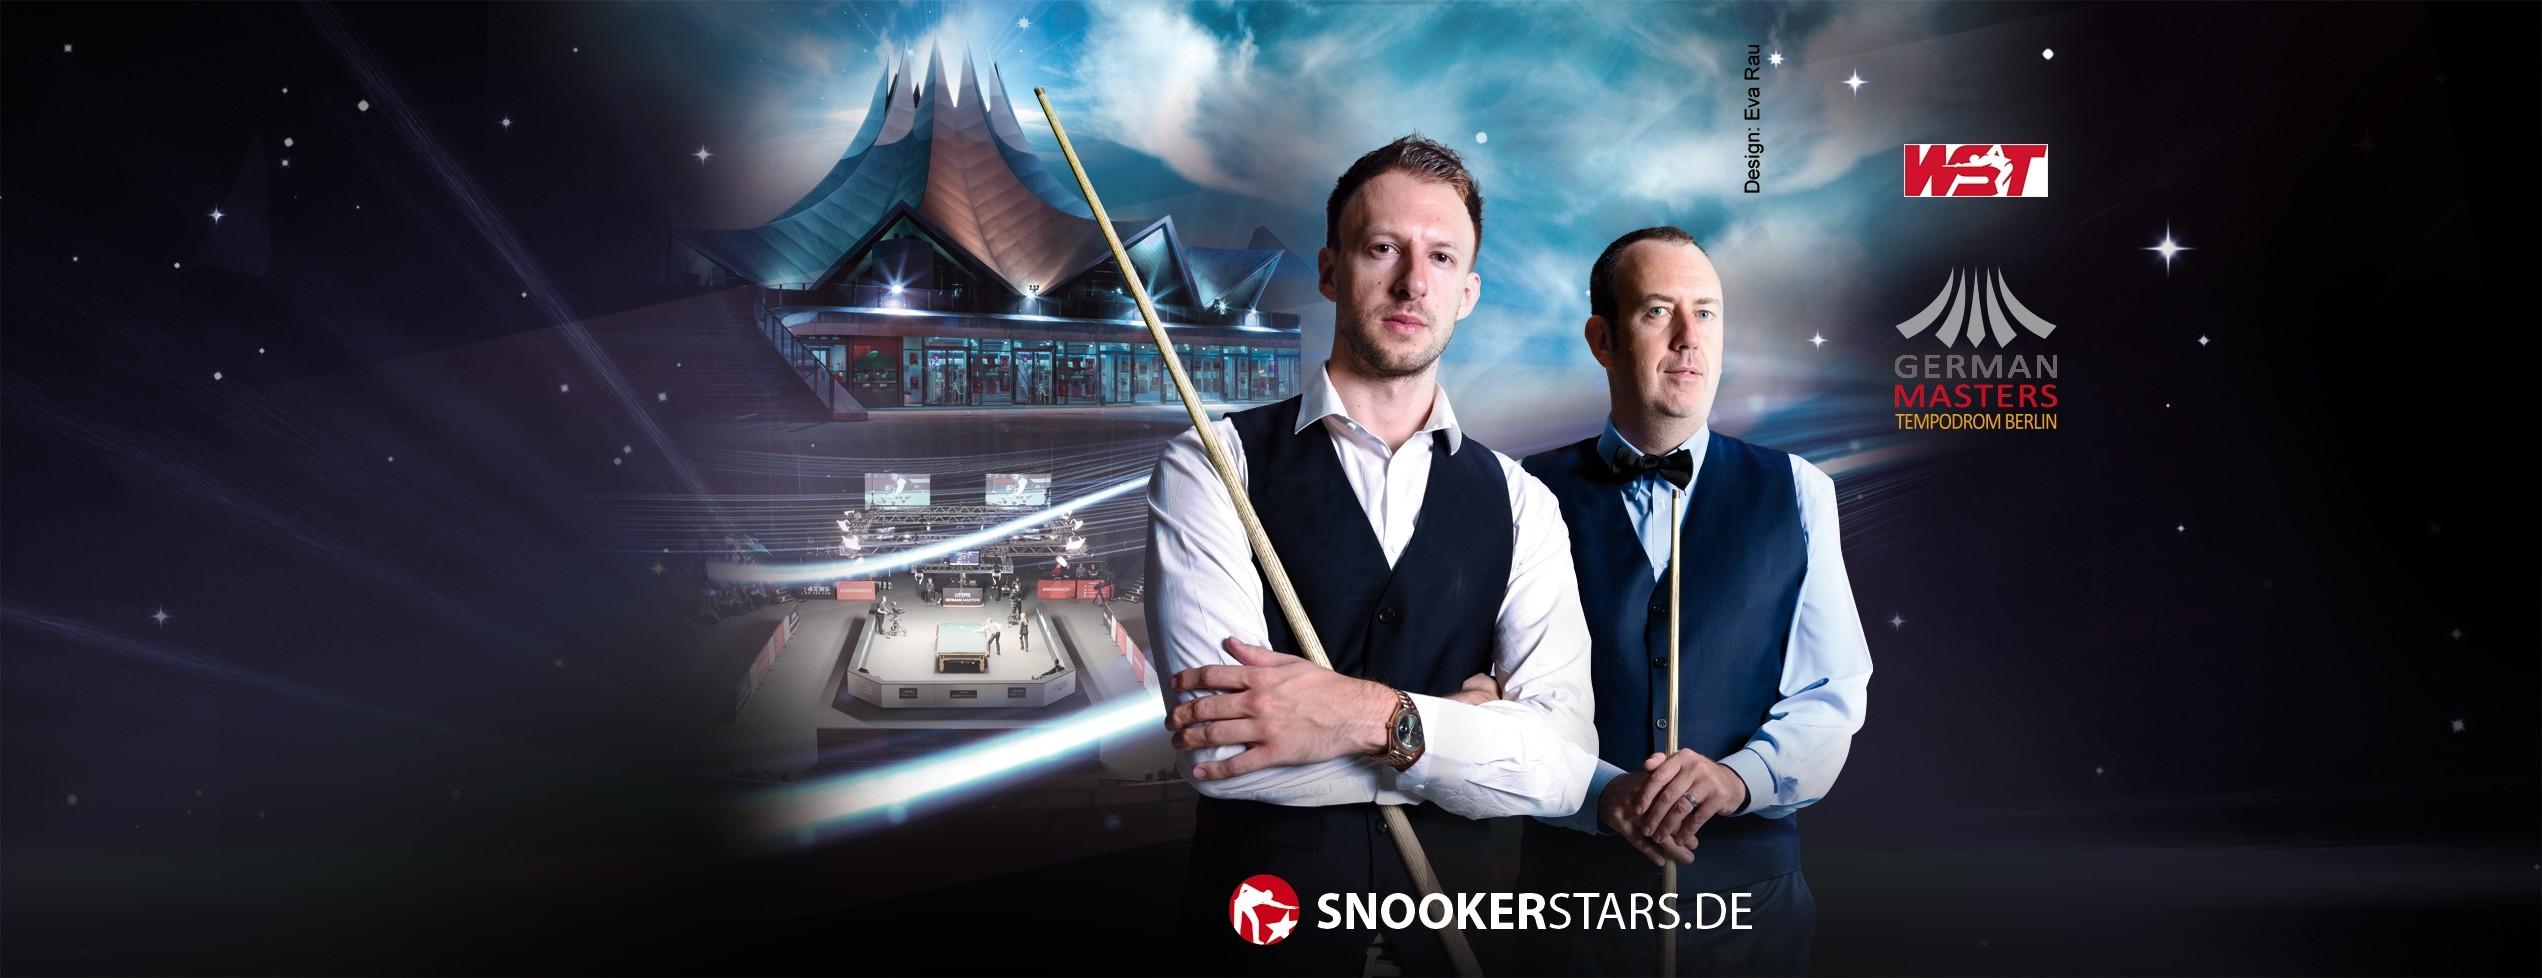 German Masters Berlin 29.01.2022 VIP BRONZE